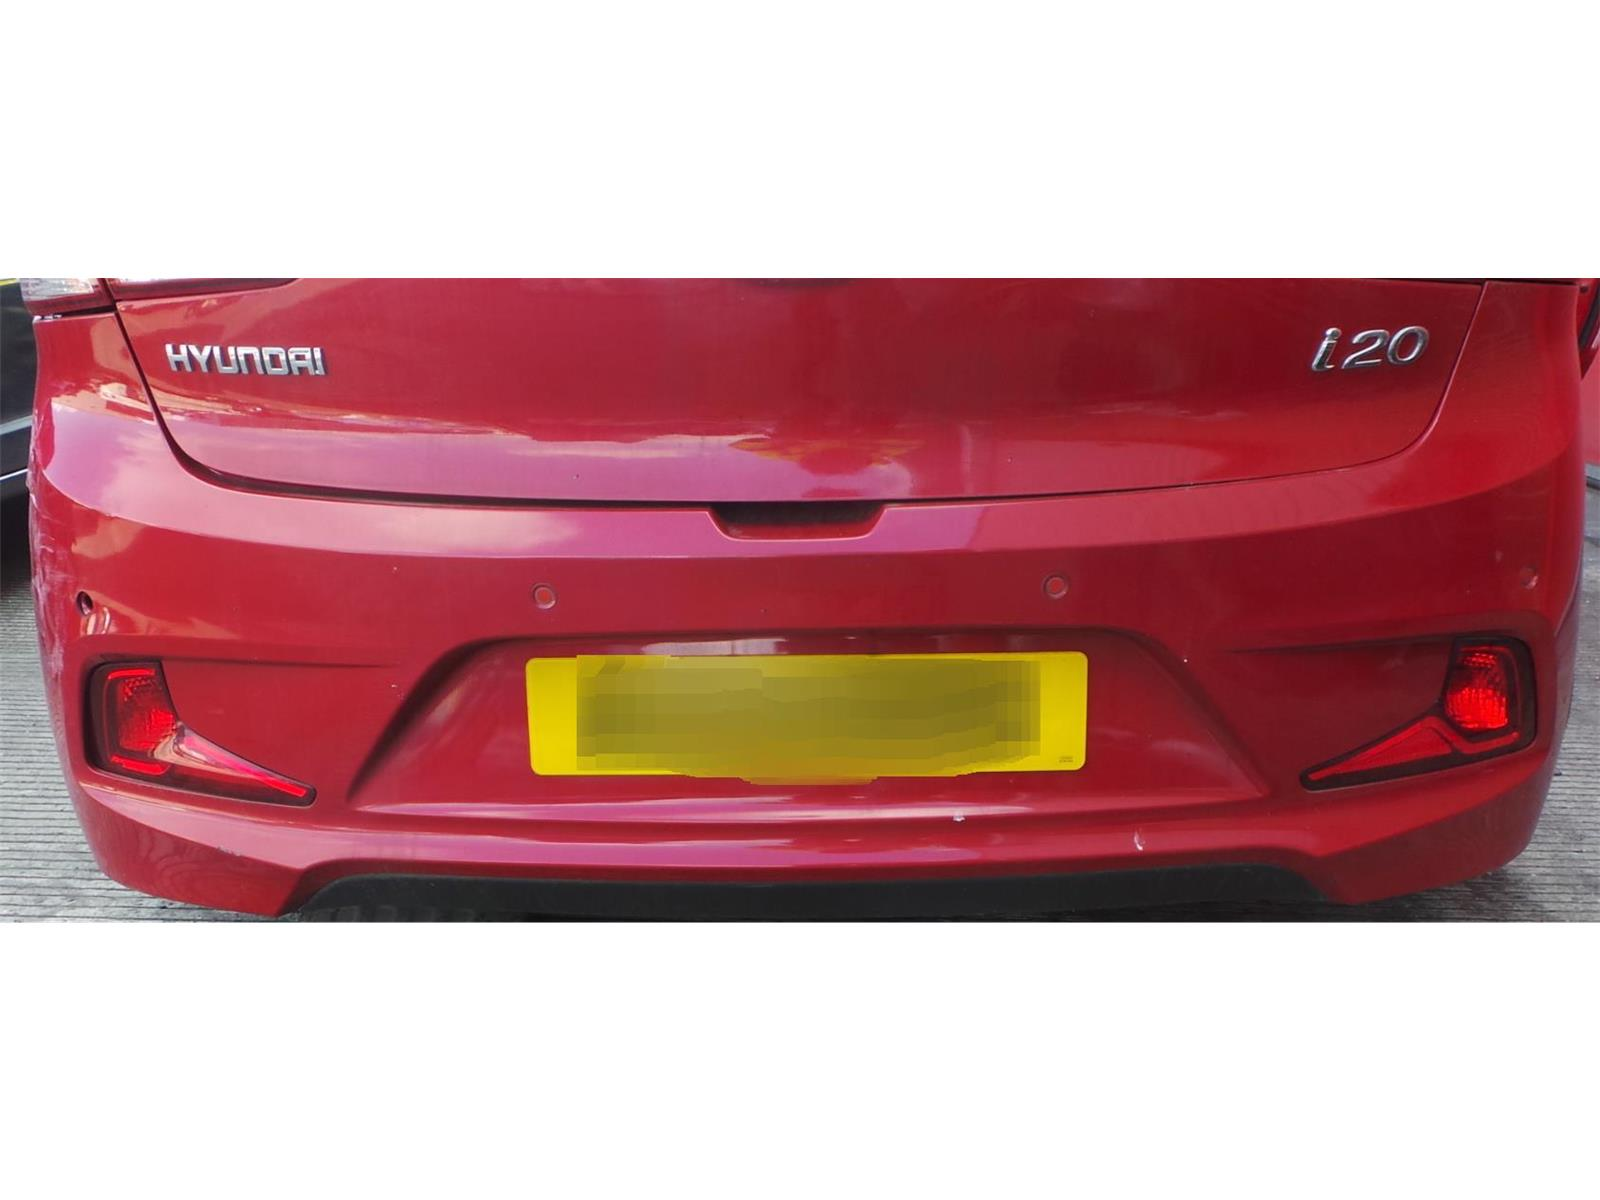 ... REAR BUMPER Hyundai i20 2015 On SE 3 Door Hatchback RED & WARRANTY -  5132250 ...